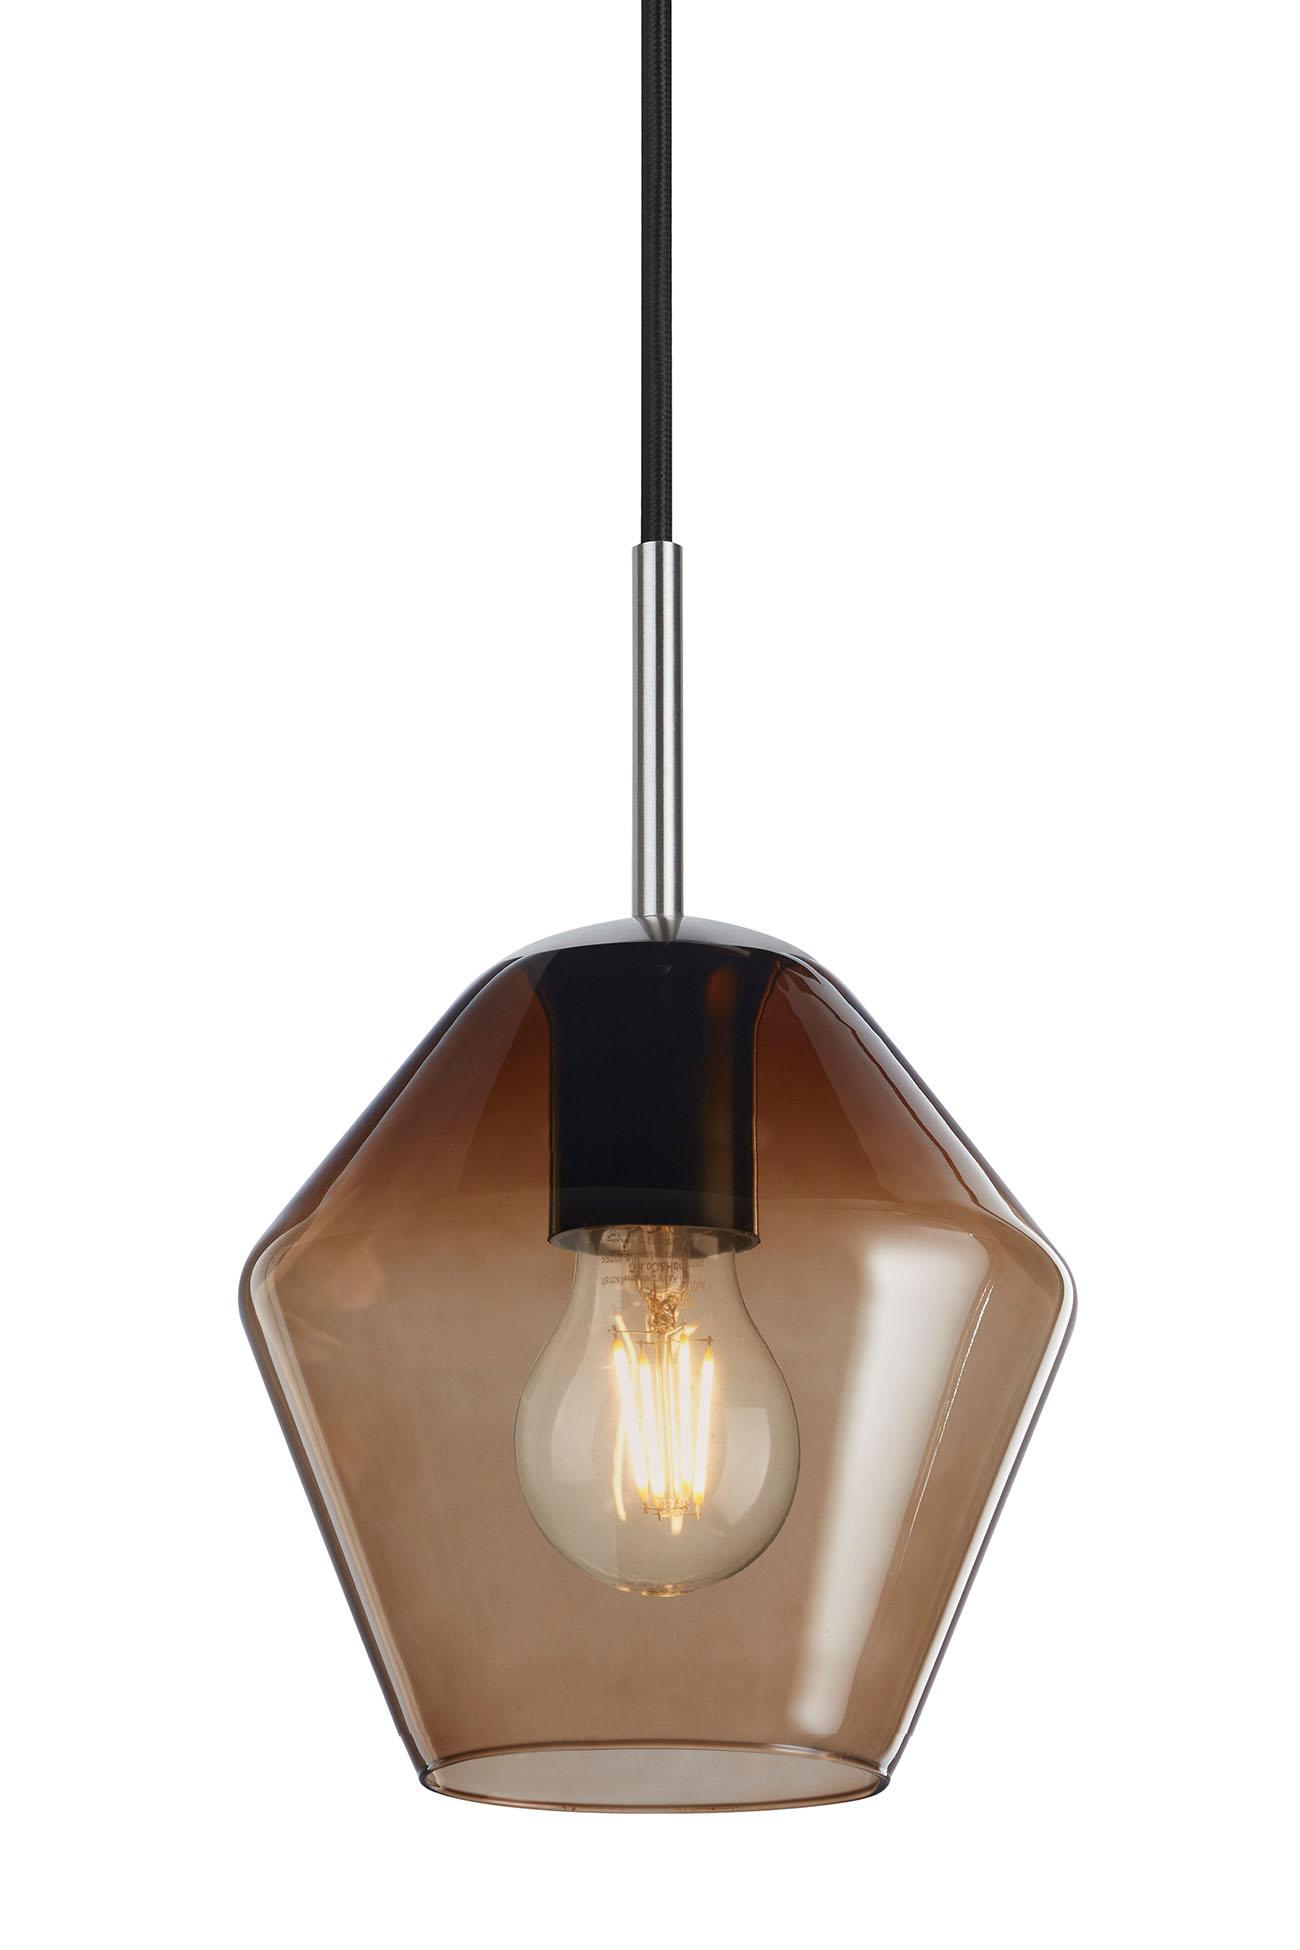 LED Pendelleuchte, Ø 19 cm, max. 40 W, Matt-Nickel-Chocolate